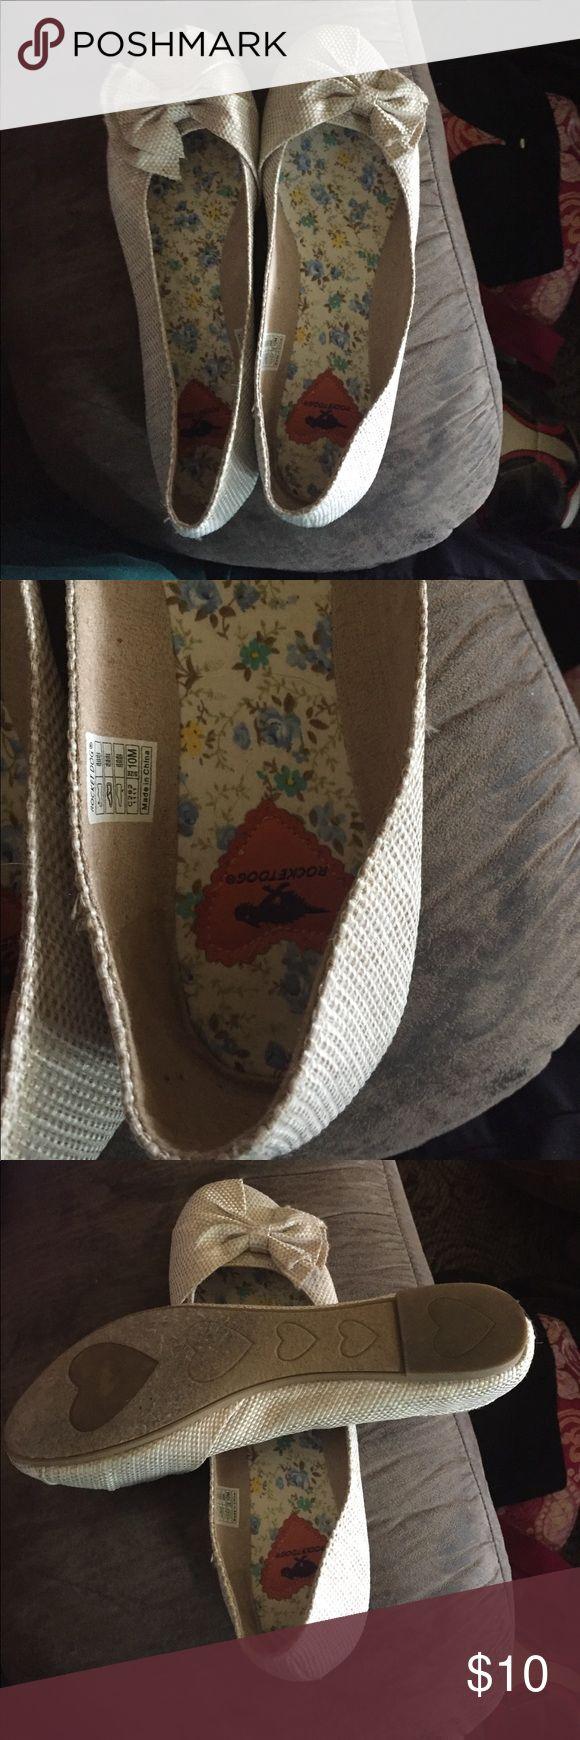 Rocket dog flats Adorable never worn rocket dog canvas flats, bow detail on the toe Rocket Dog Shoes Flats & Loafers